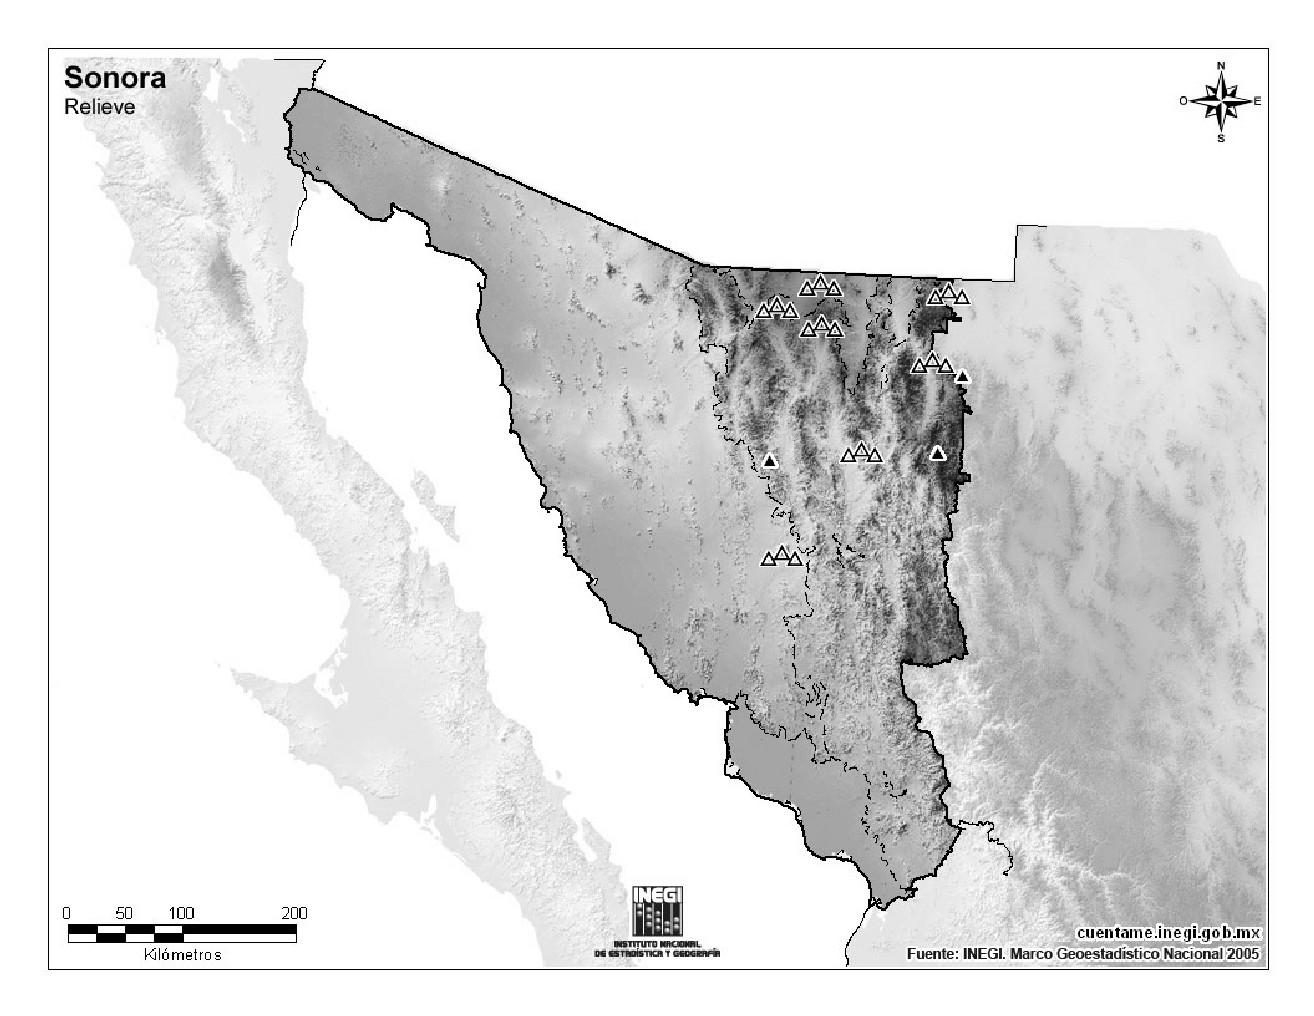 Mapa mudo de montañas de Sonora. INEGI de México